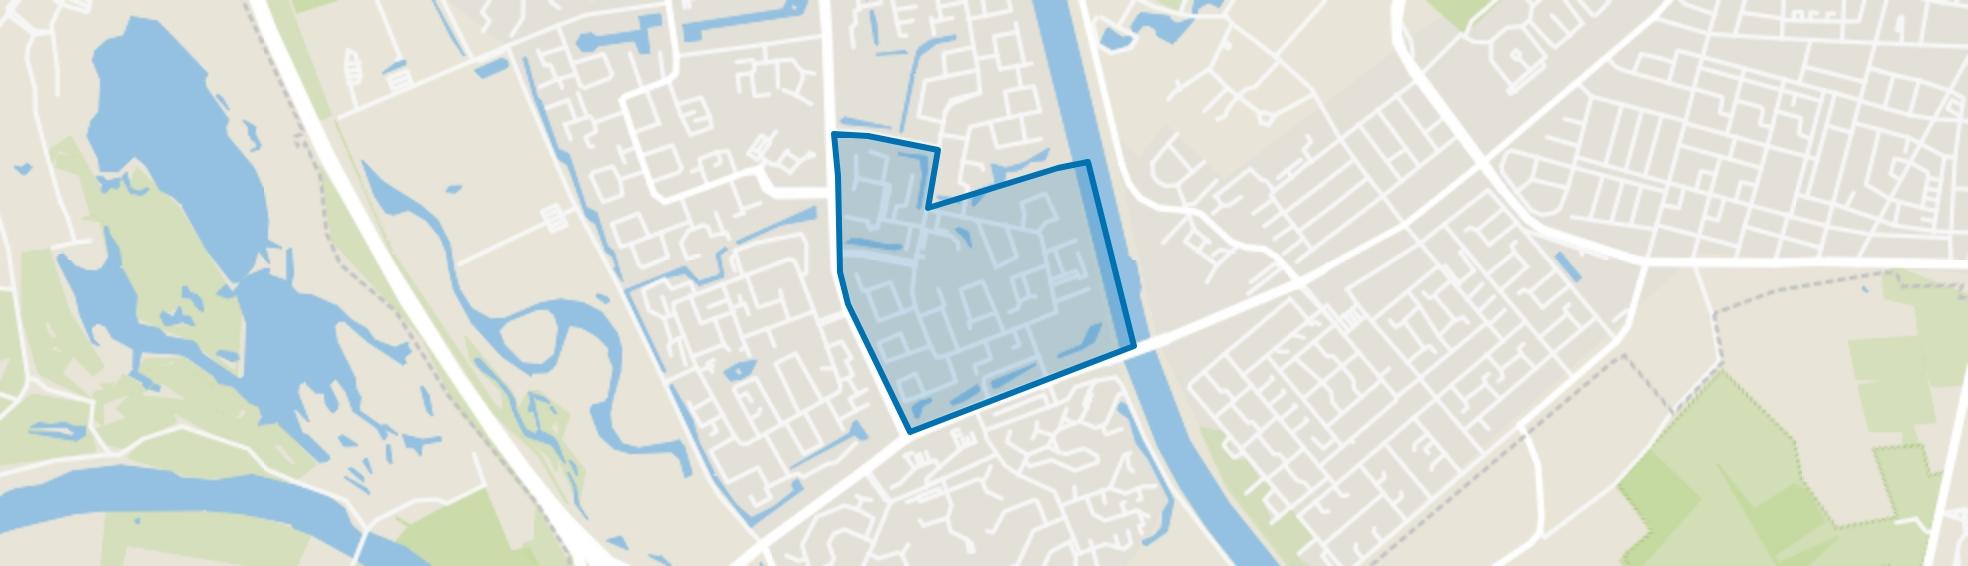 Malvert, Nijmegen map